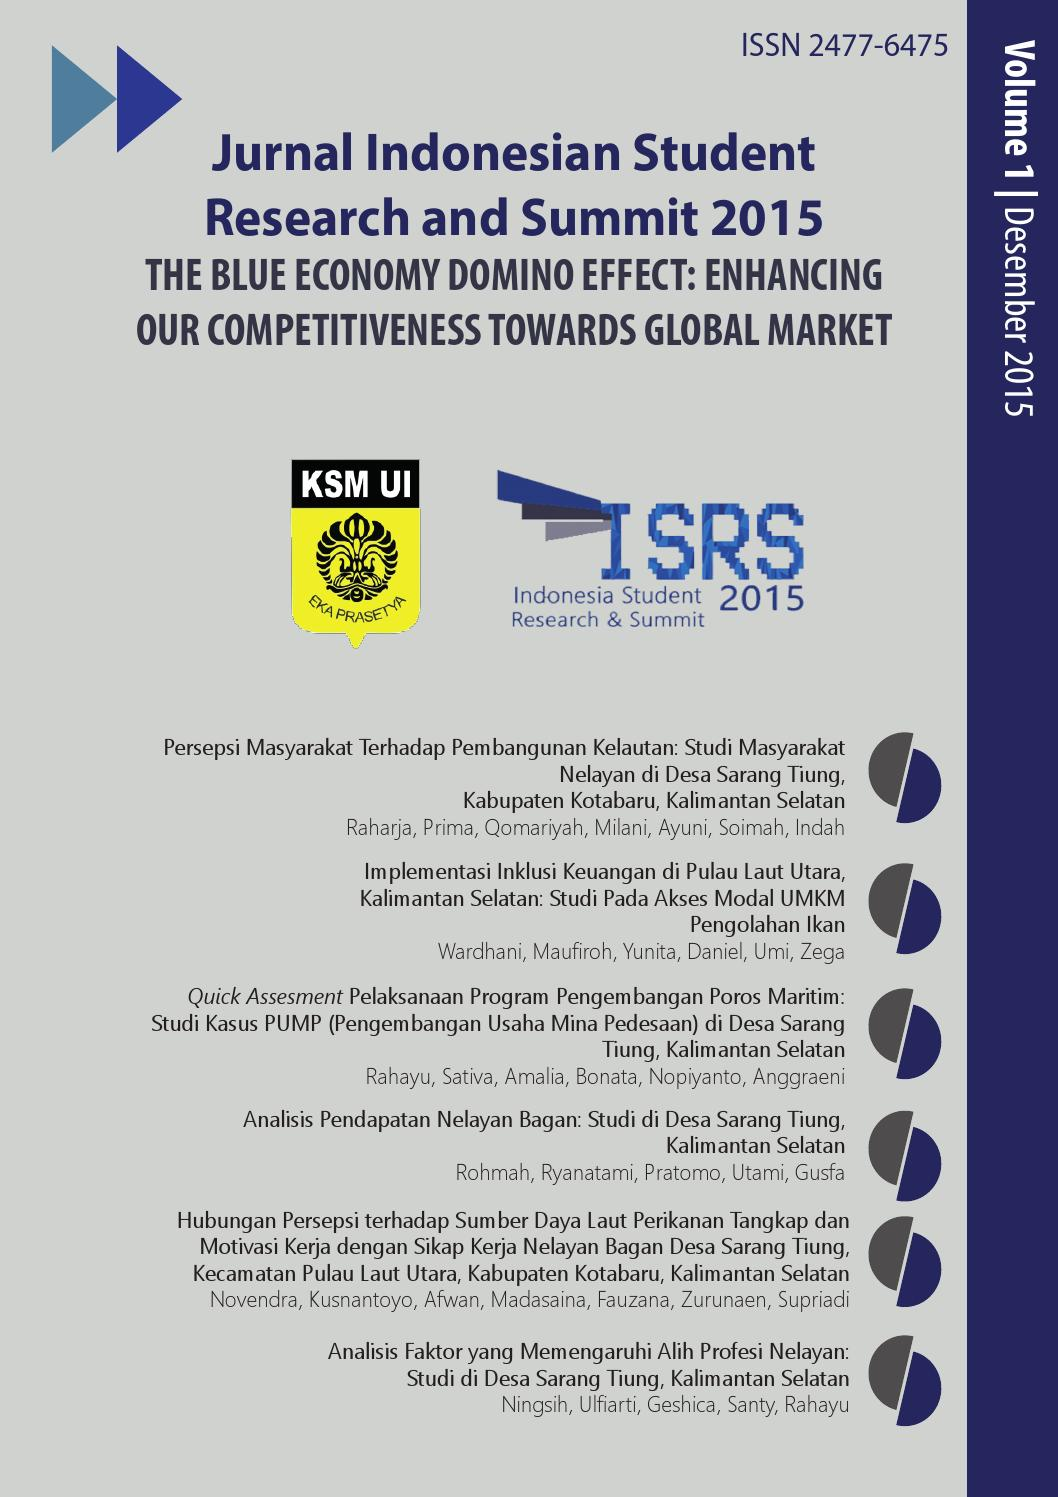 Jurnal Indonesian Student Research Summit Ksm Eka Prasetya By Produk Ukm Bumn Earring Mas Putih Mutiara Laut Ui Issuu